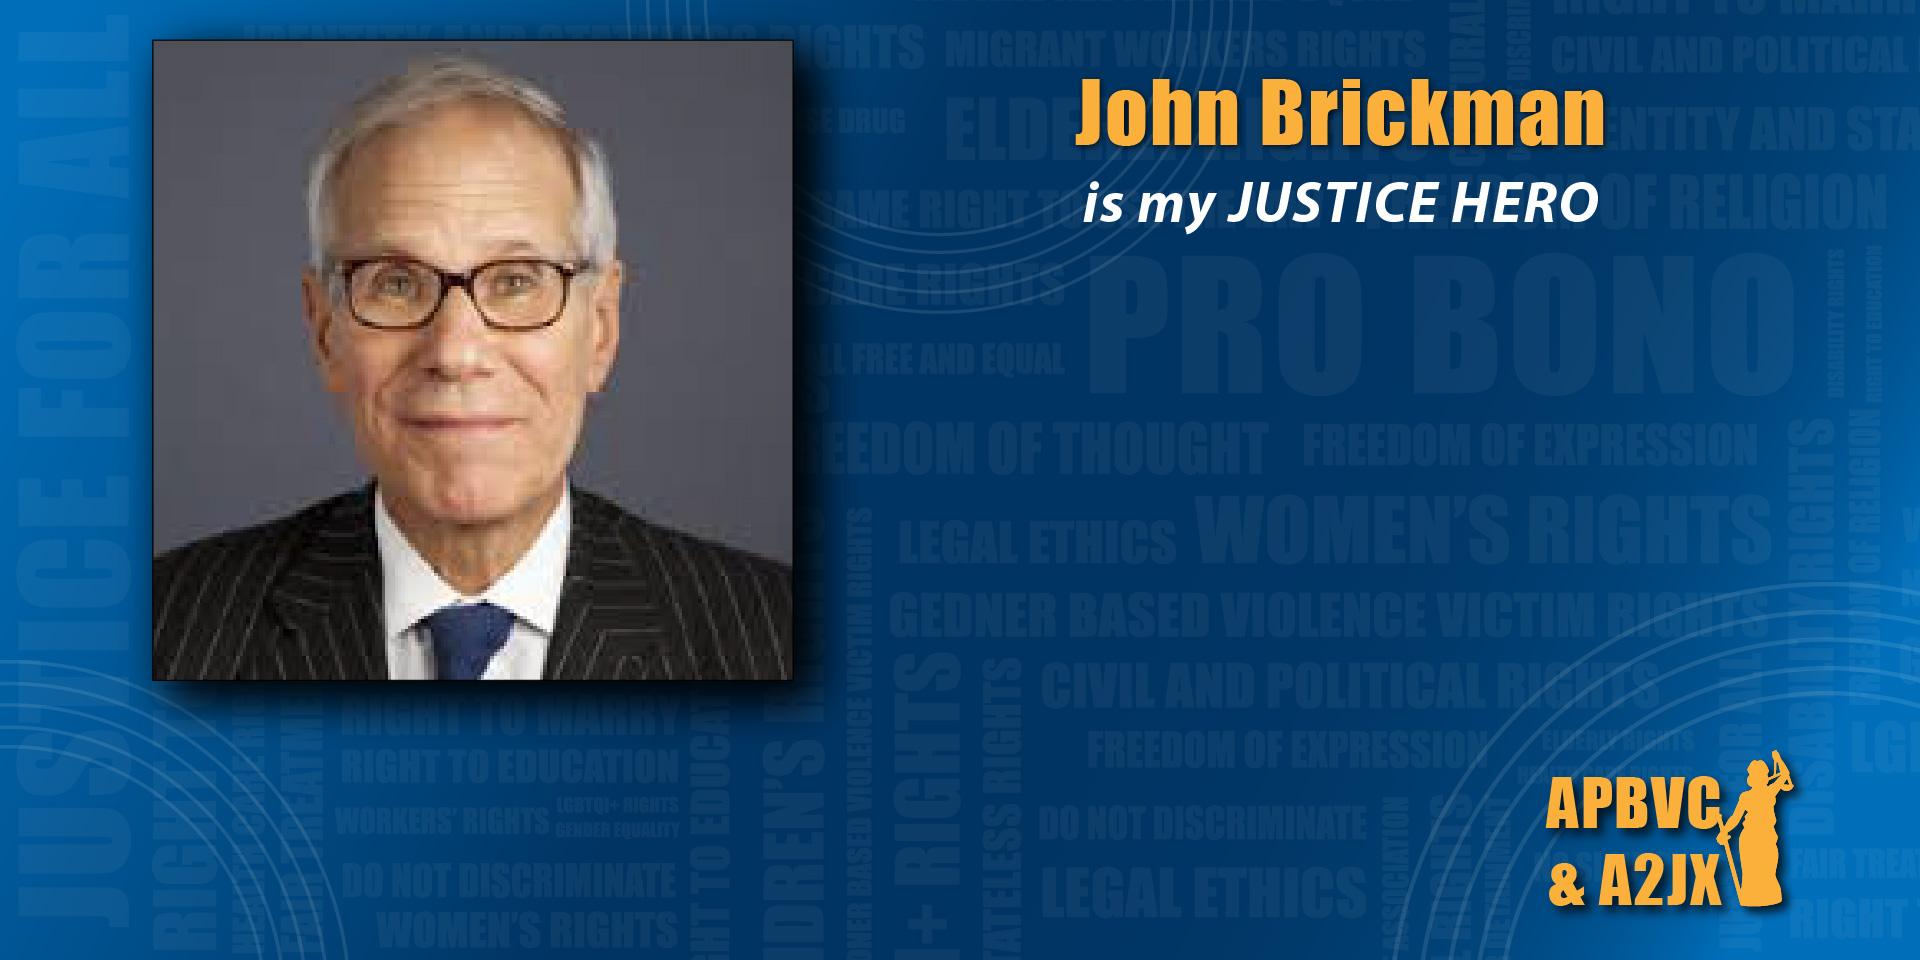 John Brickman